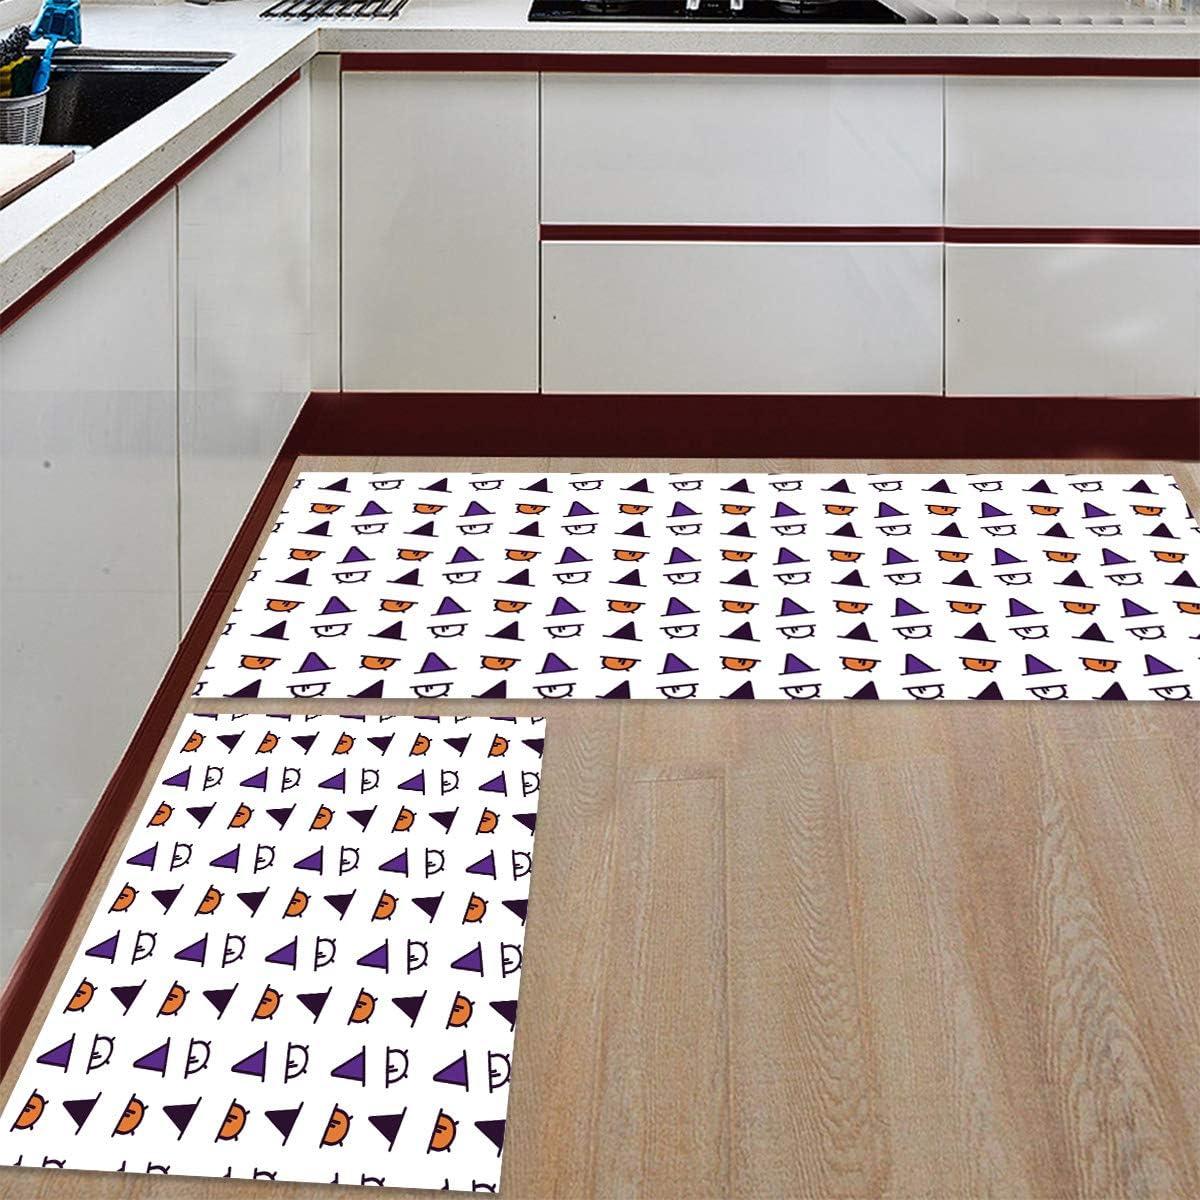 Superlatite Womenfocus Kitchen Mat Set Indianapolis Mall Anti-WearNon-Slip Rug 2 Pi Floor